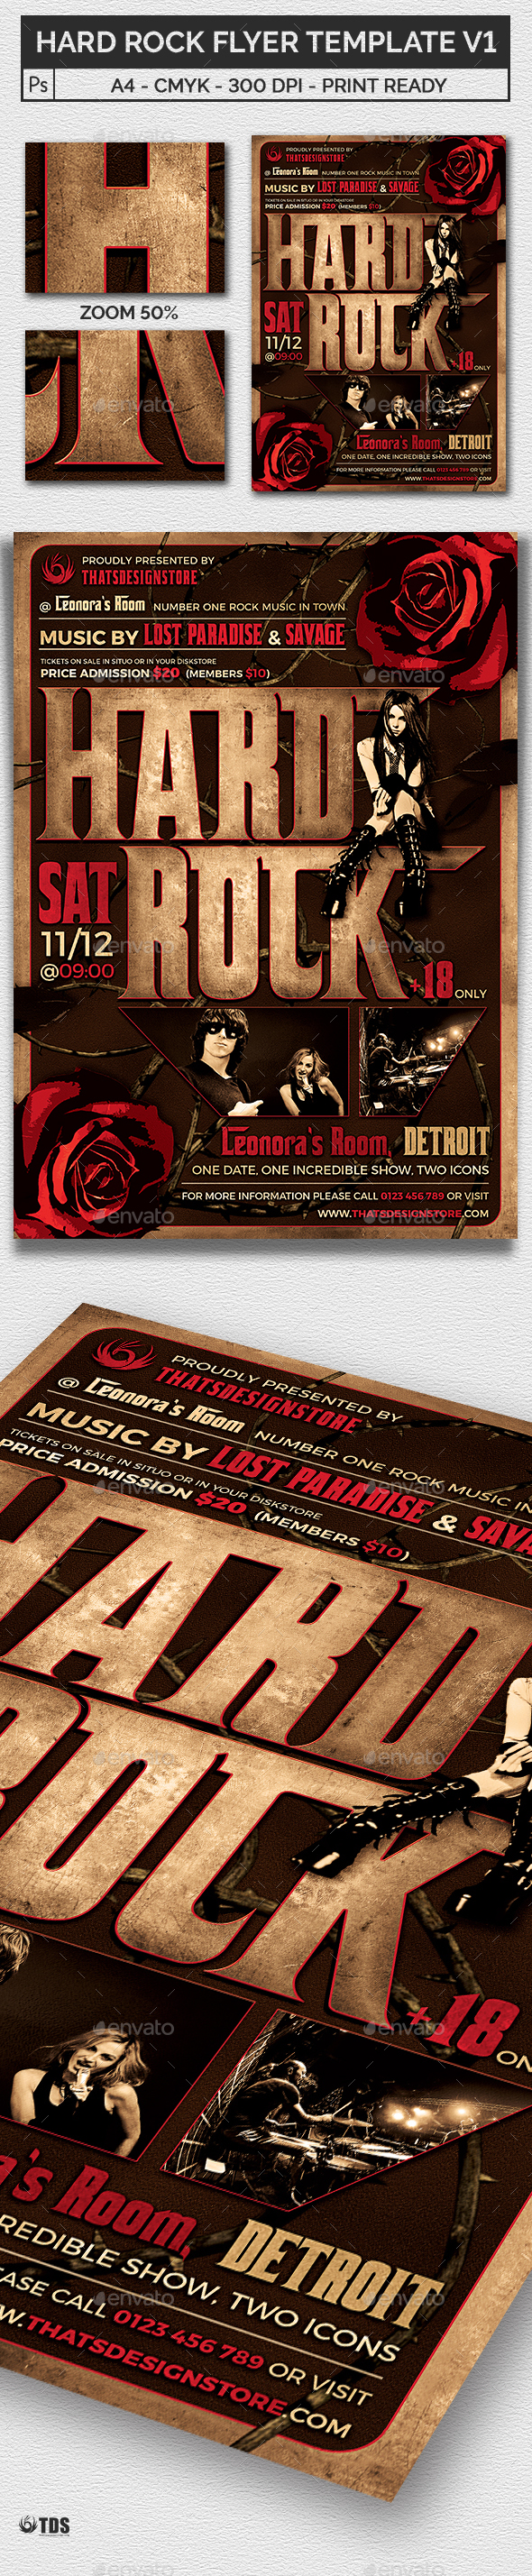 Hard Rock Flyer Template V1 - Print Templates